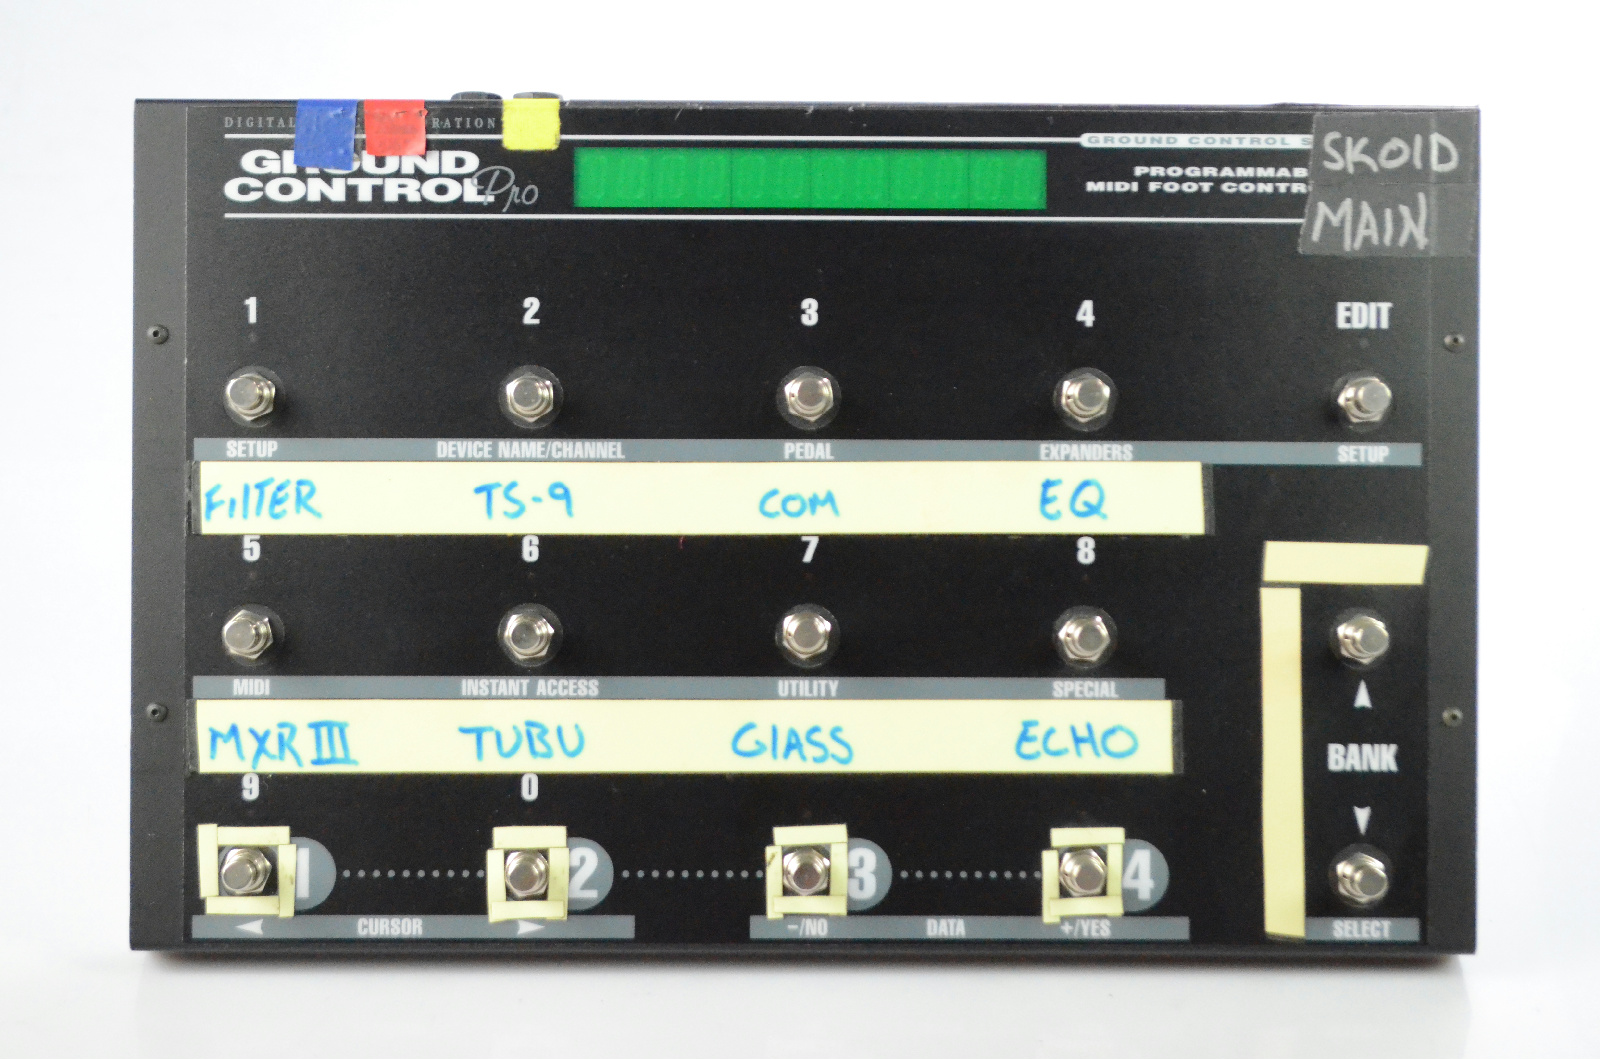 Digital Music Ground Control Pro MIDI Controller Tim Skold Marilyn Manson #33836